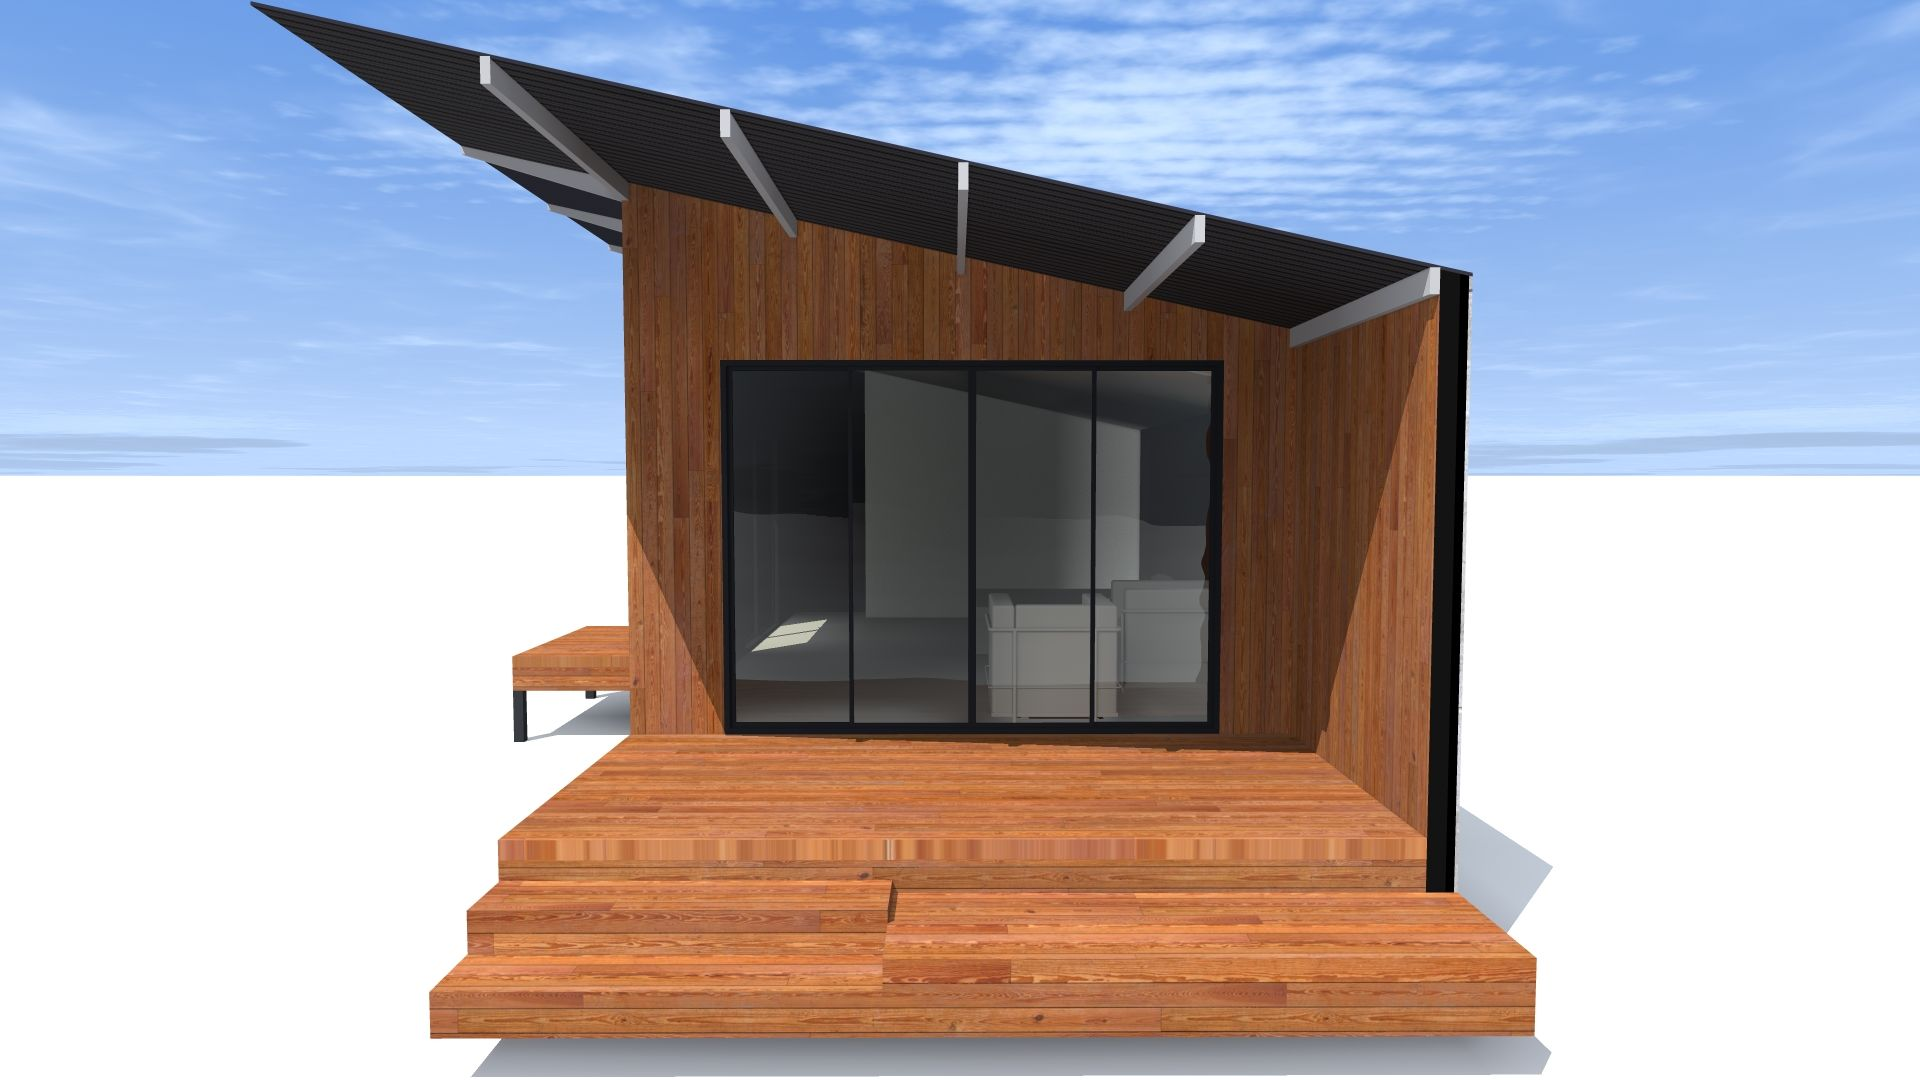 Archiblox Prefabricated Modular Architecture - Cabin - Oceania Architecture Etc